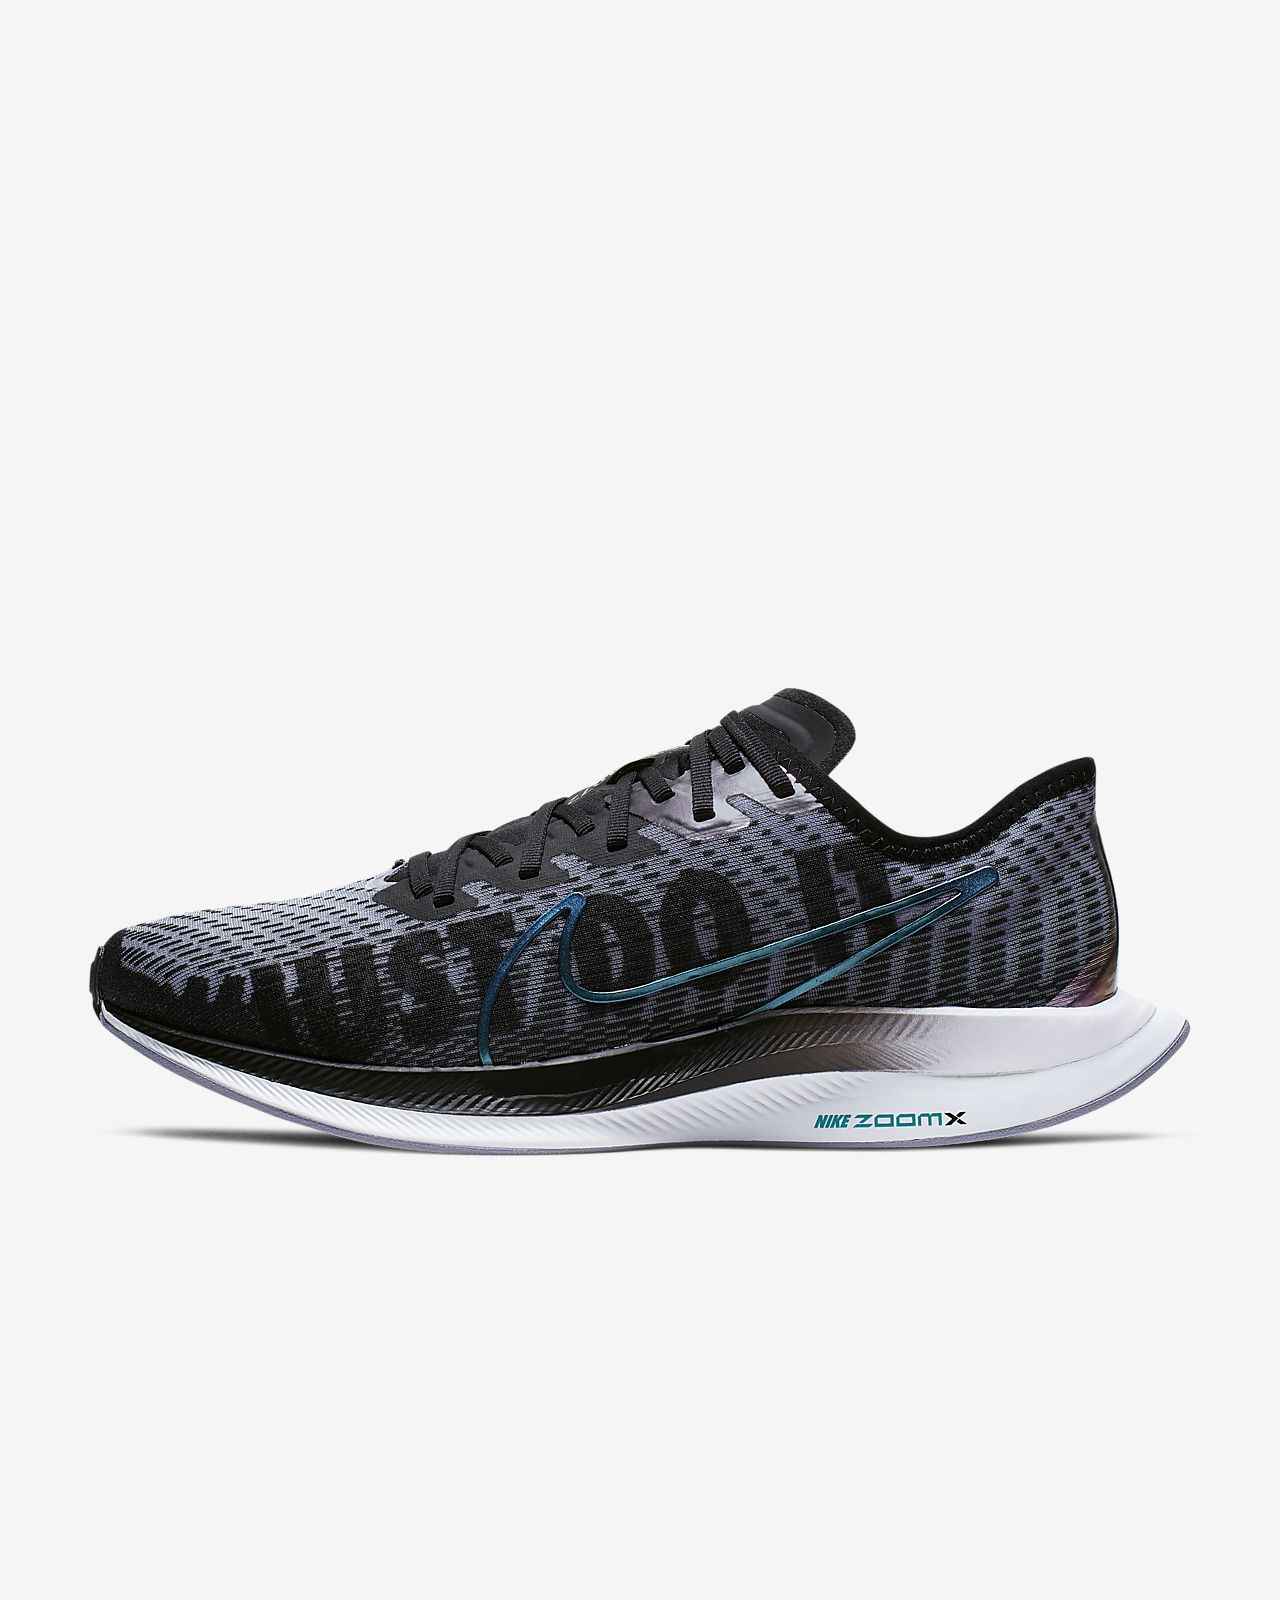 Nike Zoom Pegasus Turbo 2 Rise Kadın Koşu Ayakkabısı